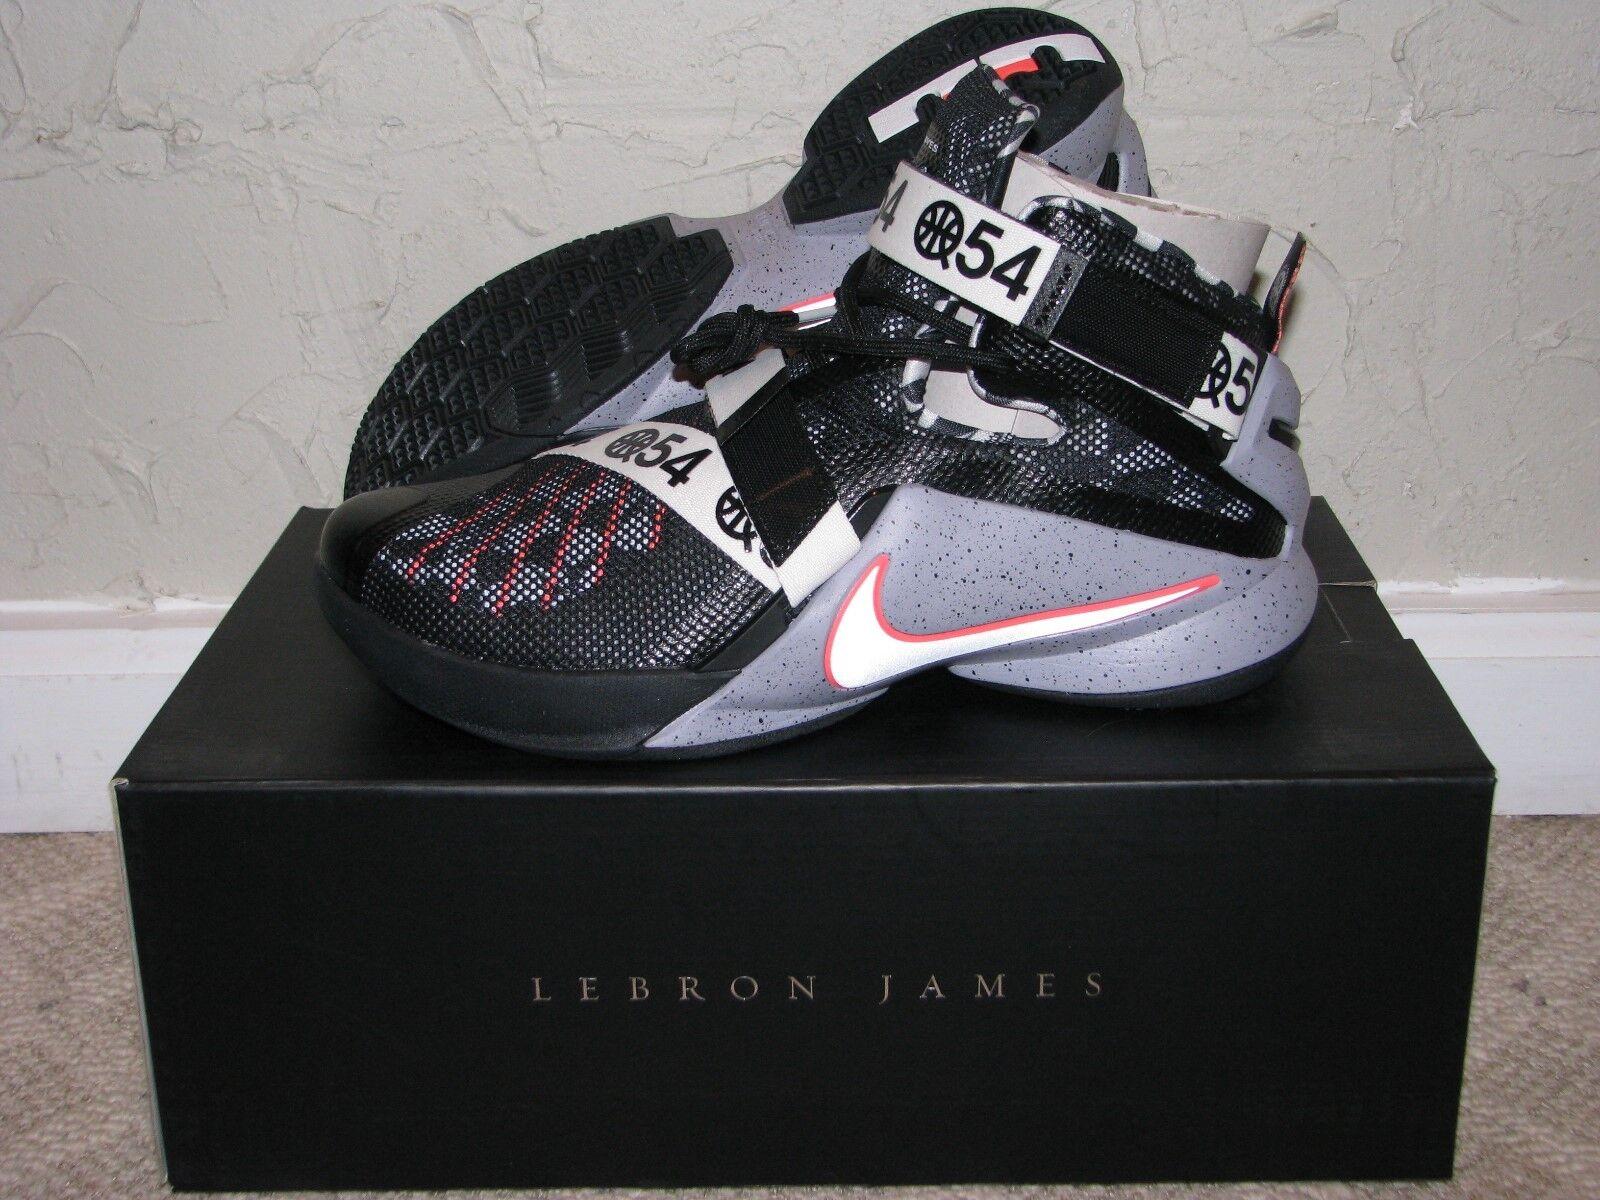 Nike lebron soldat ix 9 begrenzte quai 54 blk blk blk / wht mens größe 10 ds neu!james 2b0722